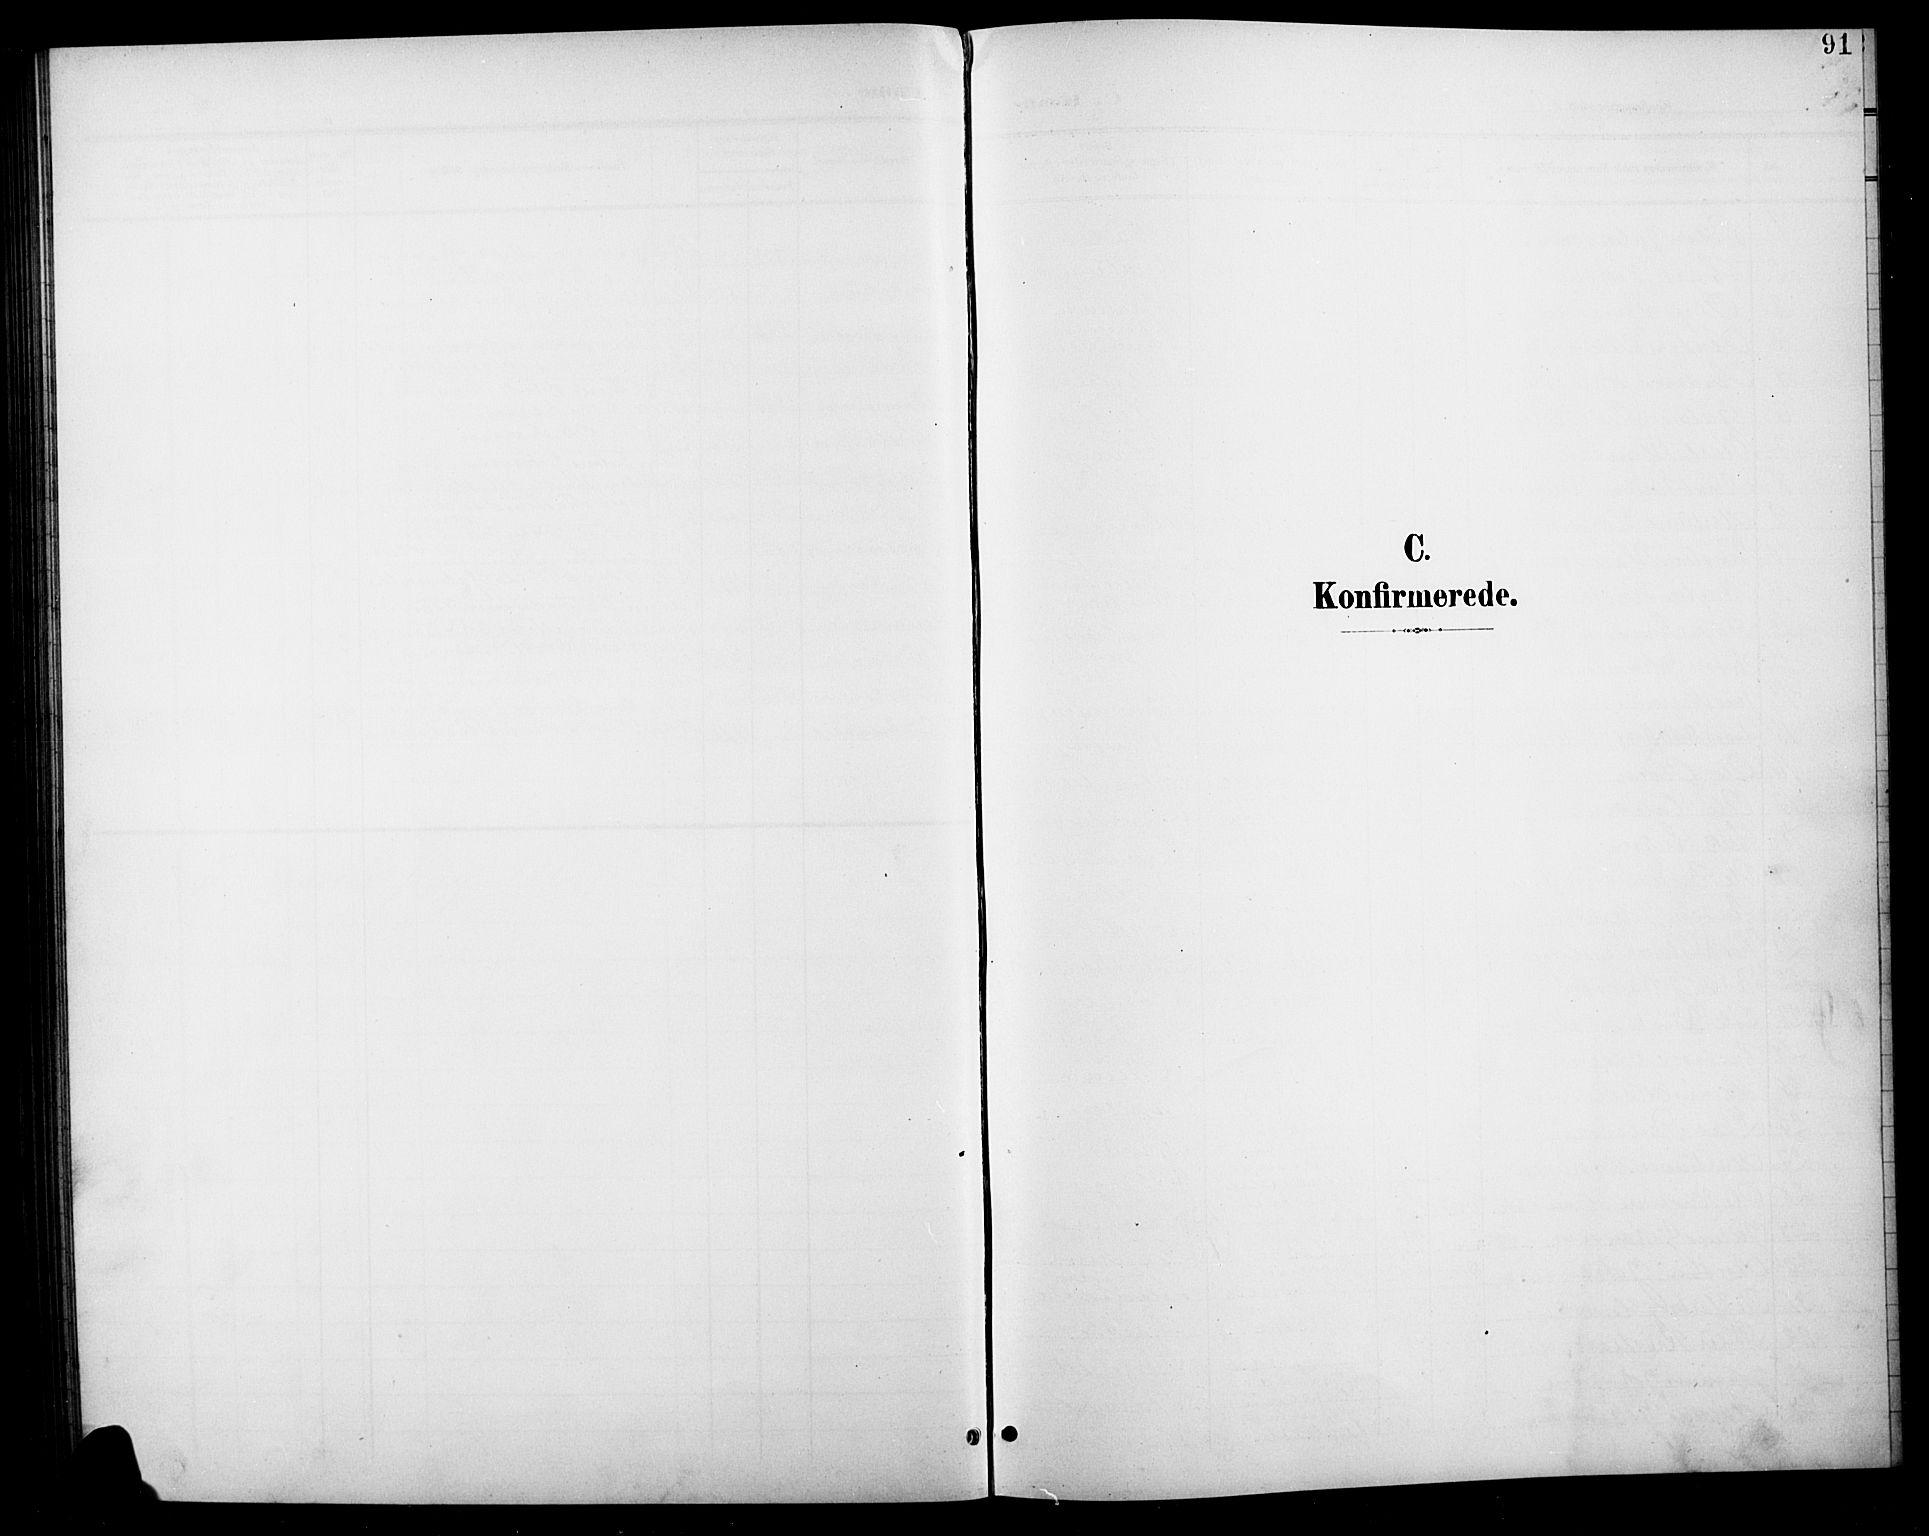 SAH, Søndre Land prestekontor, L/L0004: Klokkerbok nr. 4, 1901-1915, s. 91